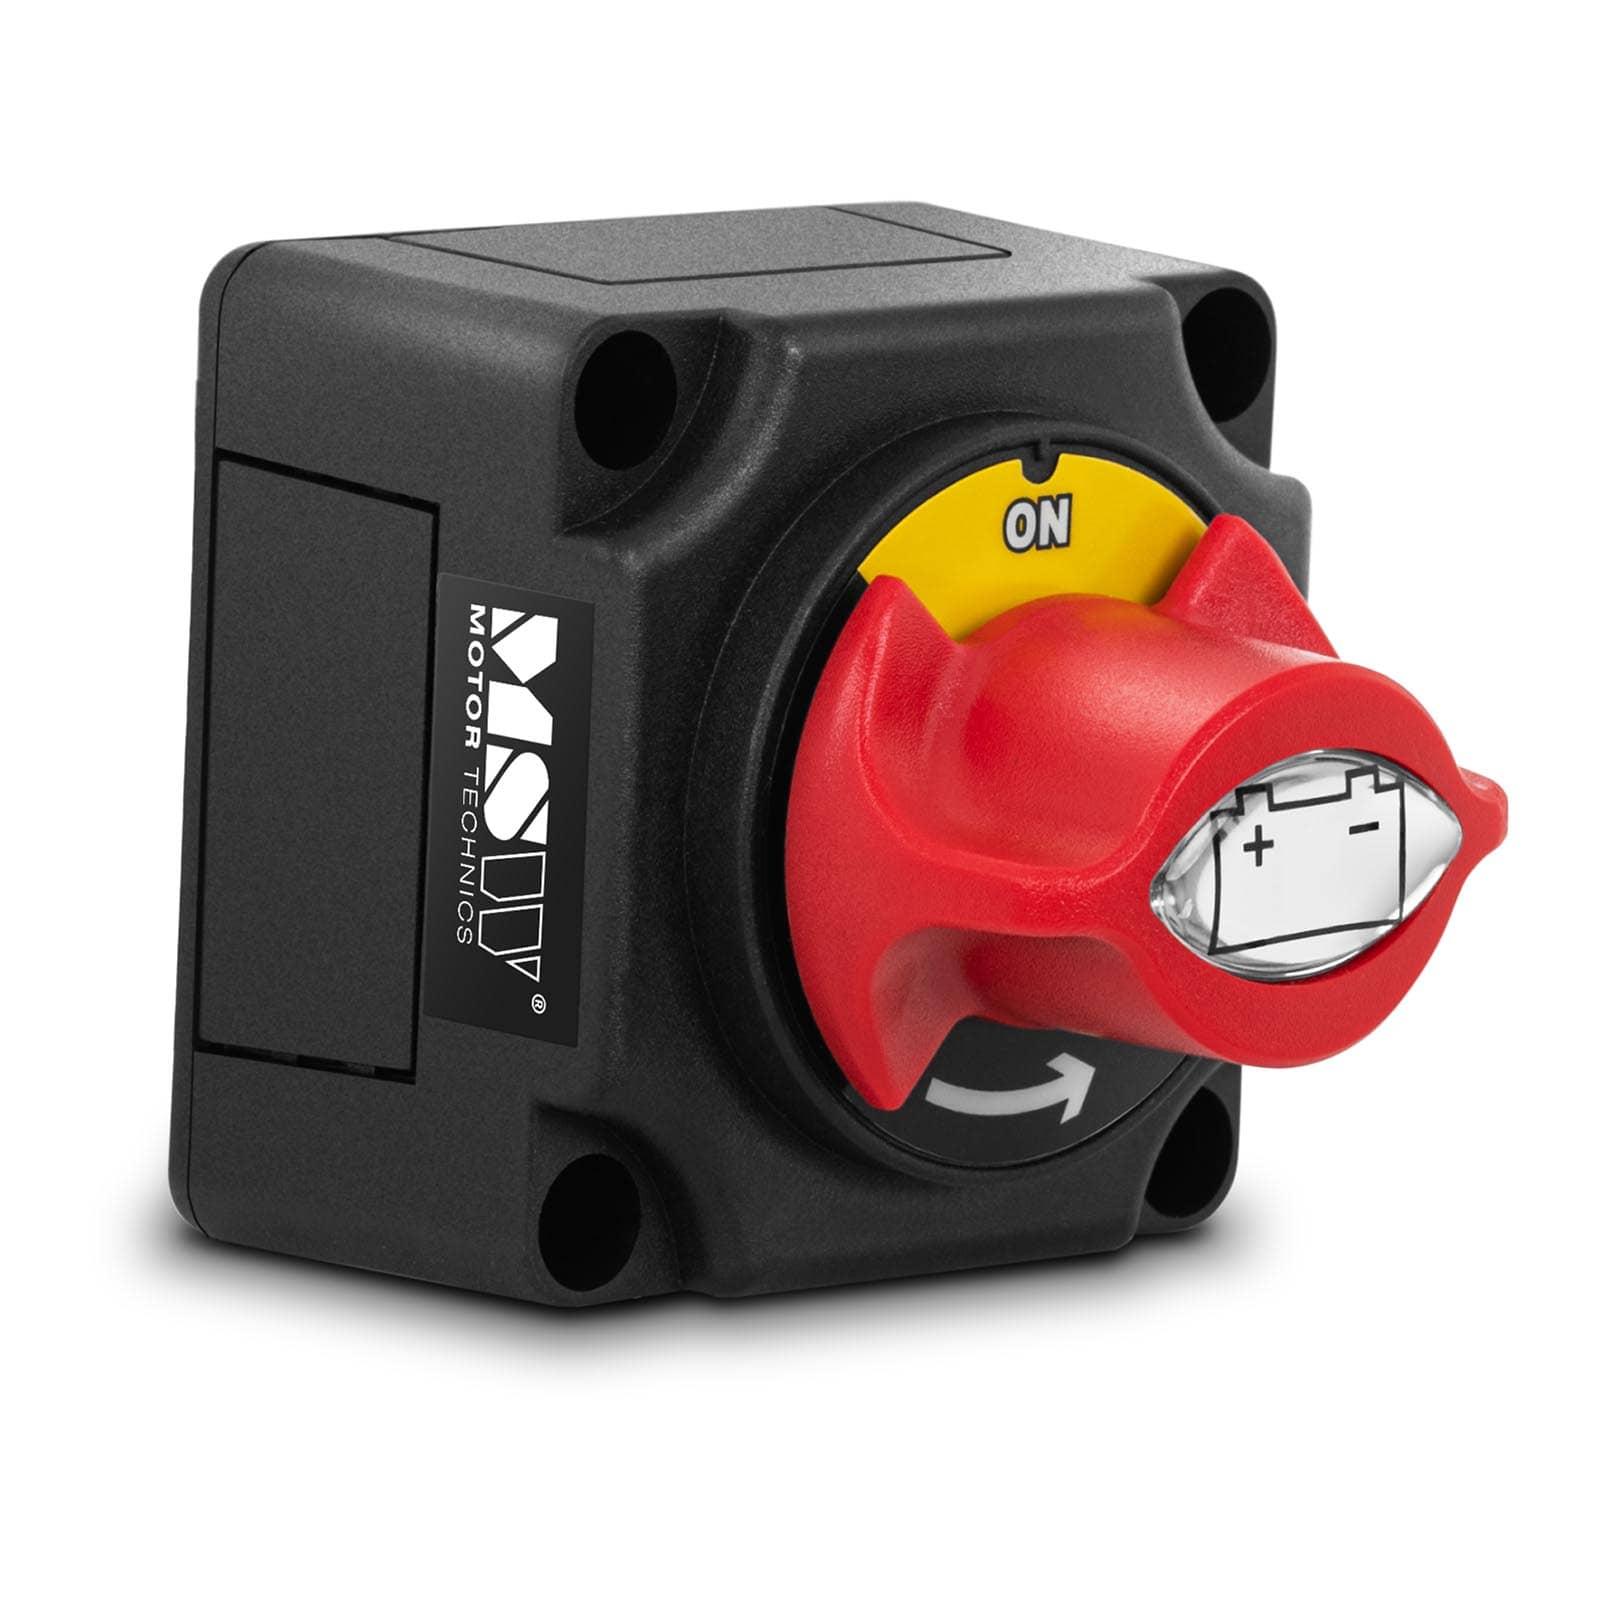 Batteriehauptschalter